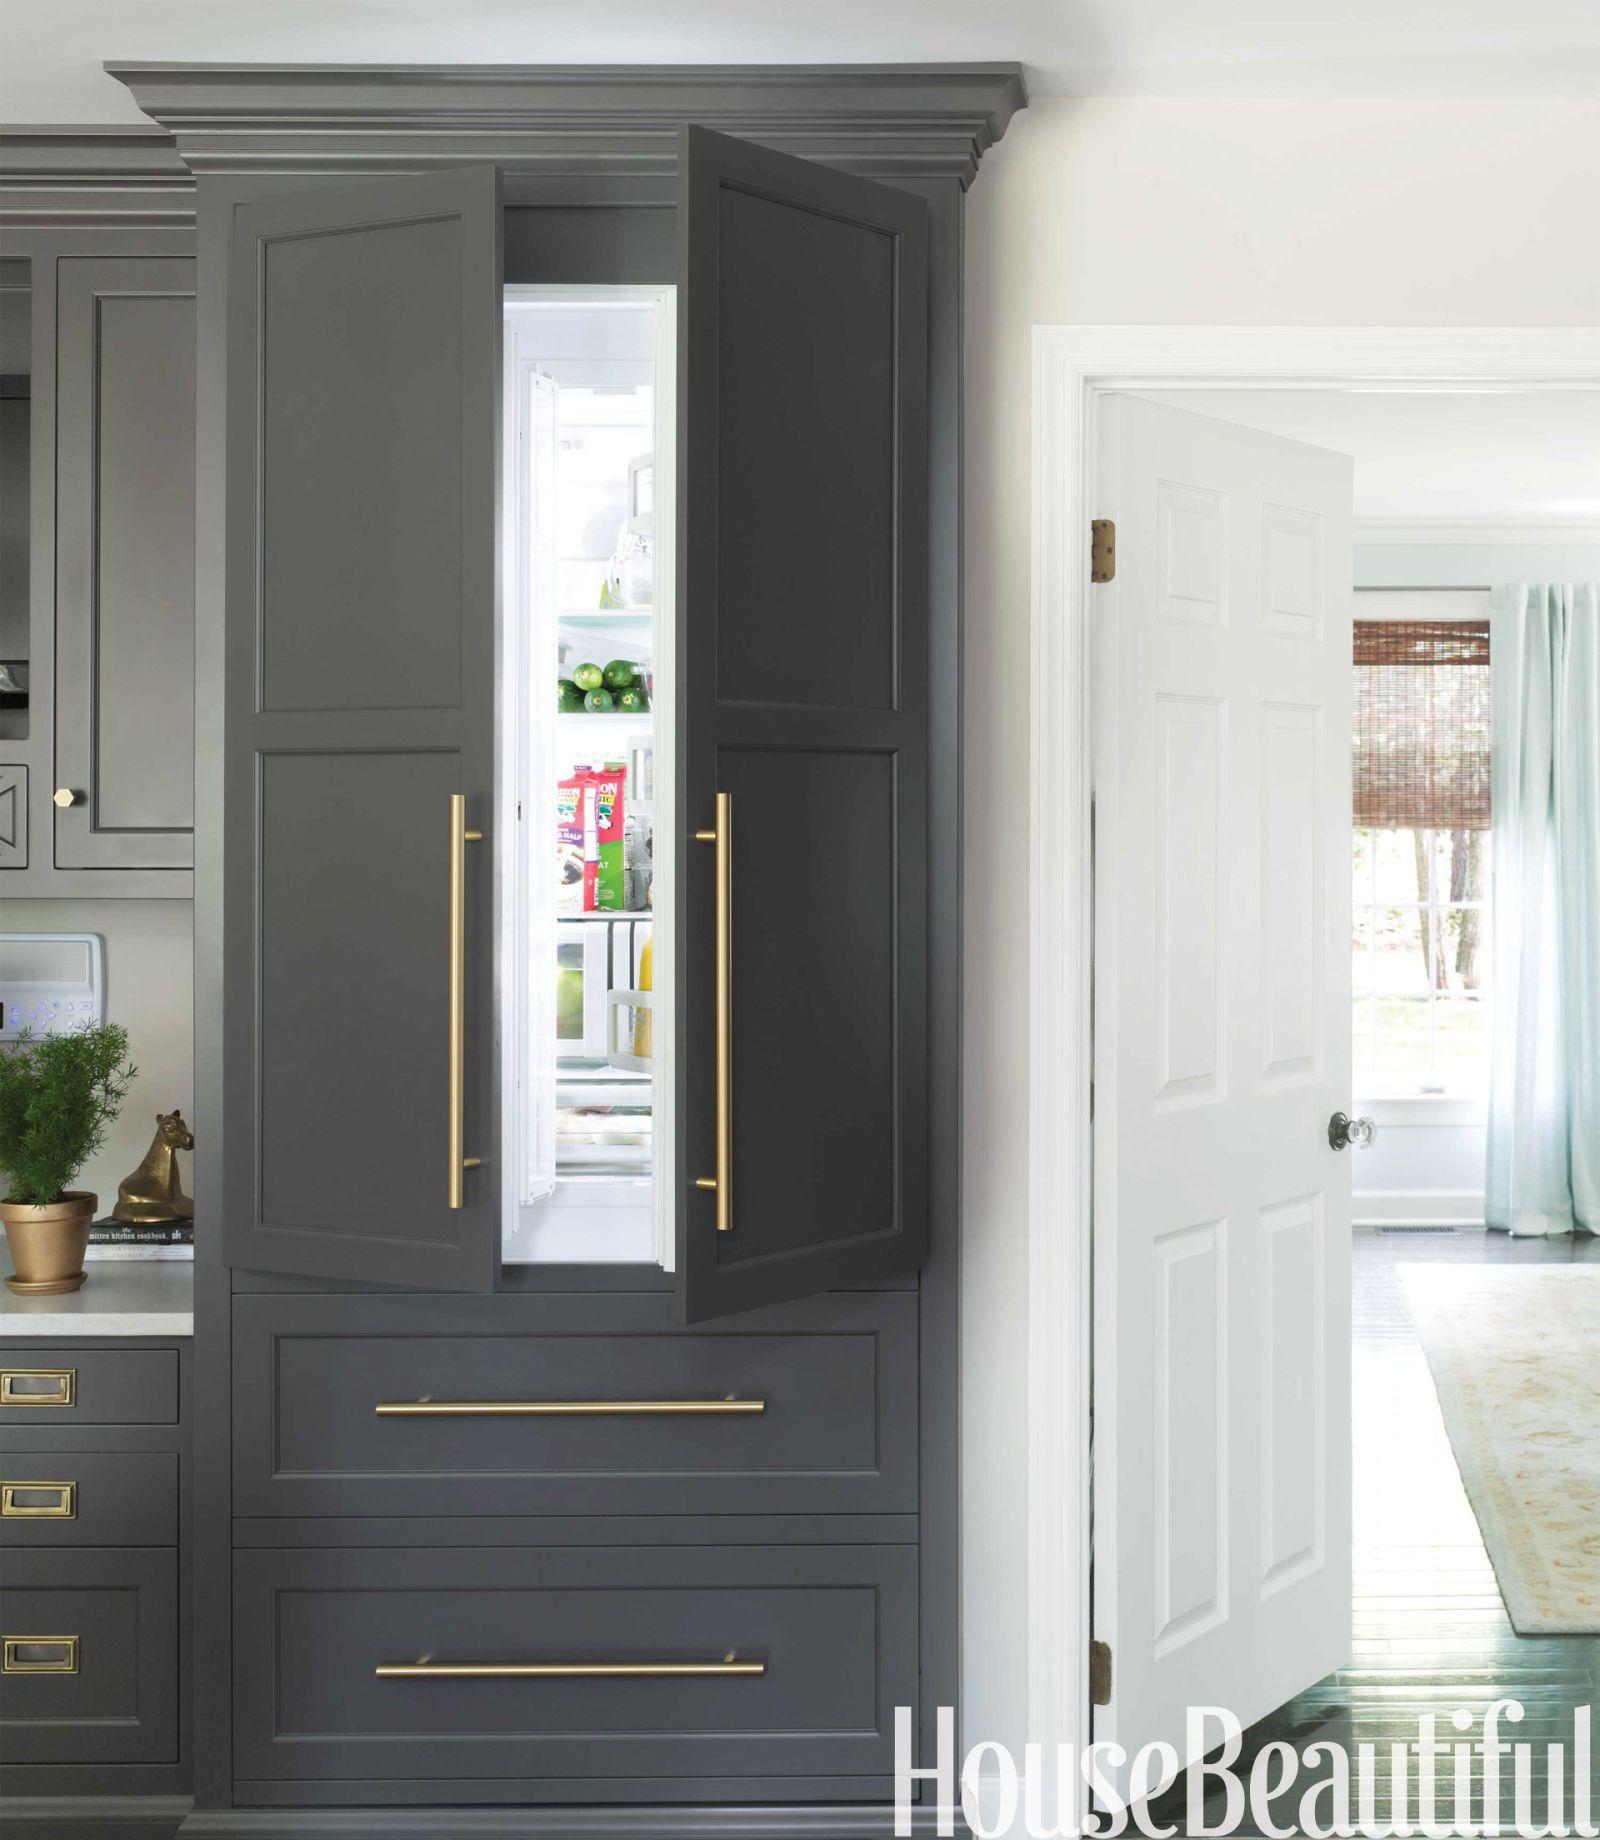 paneled refrigerator house beautiful